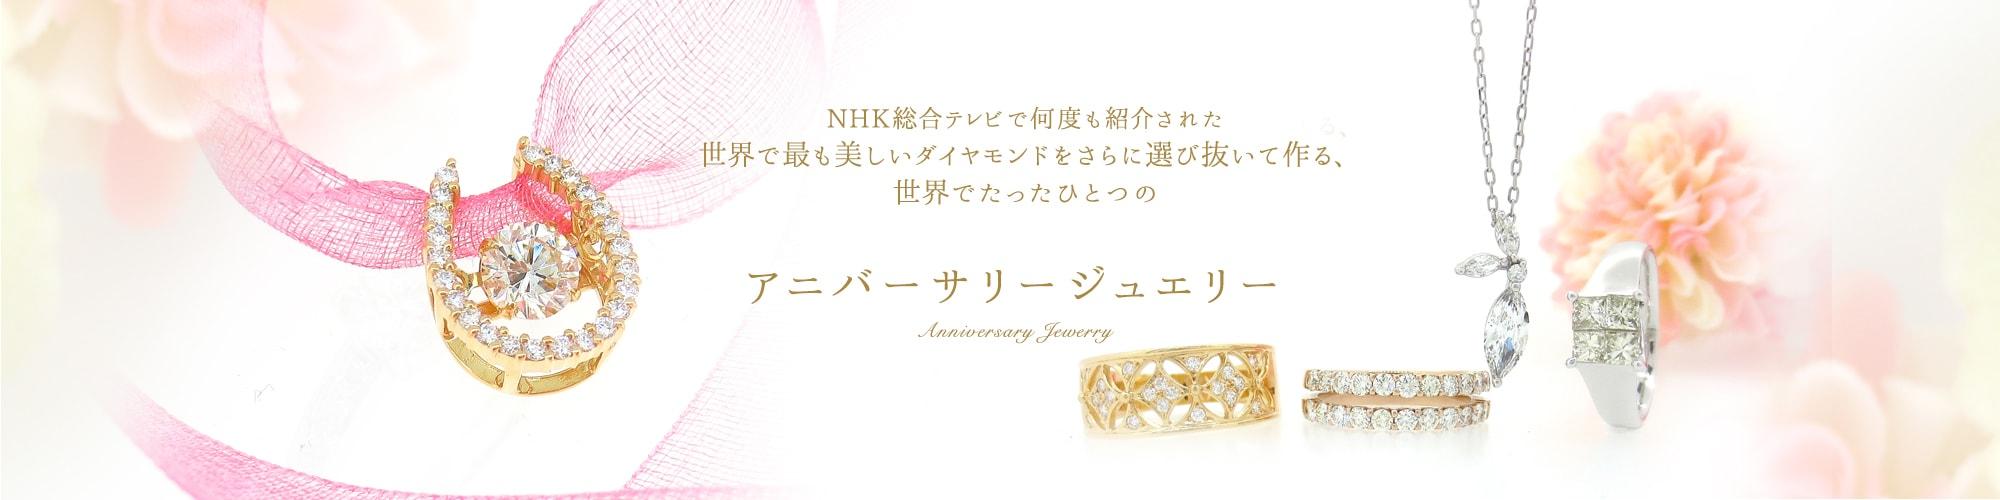 NHK総合テレビでなんども紹介された世界で最も美しいダイヤモンドをさらに選び抜いて作る、世界でたったひとつのアニバーサリージュエリー